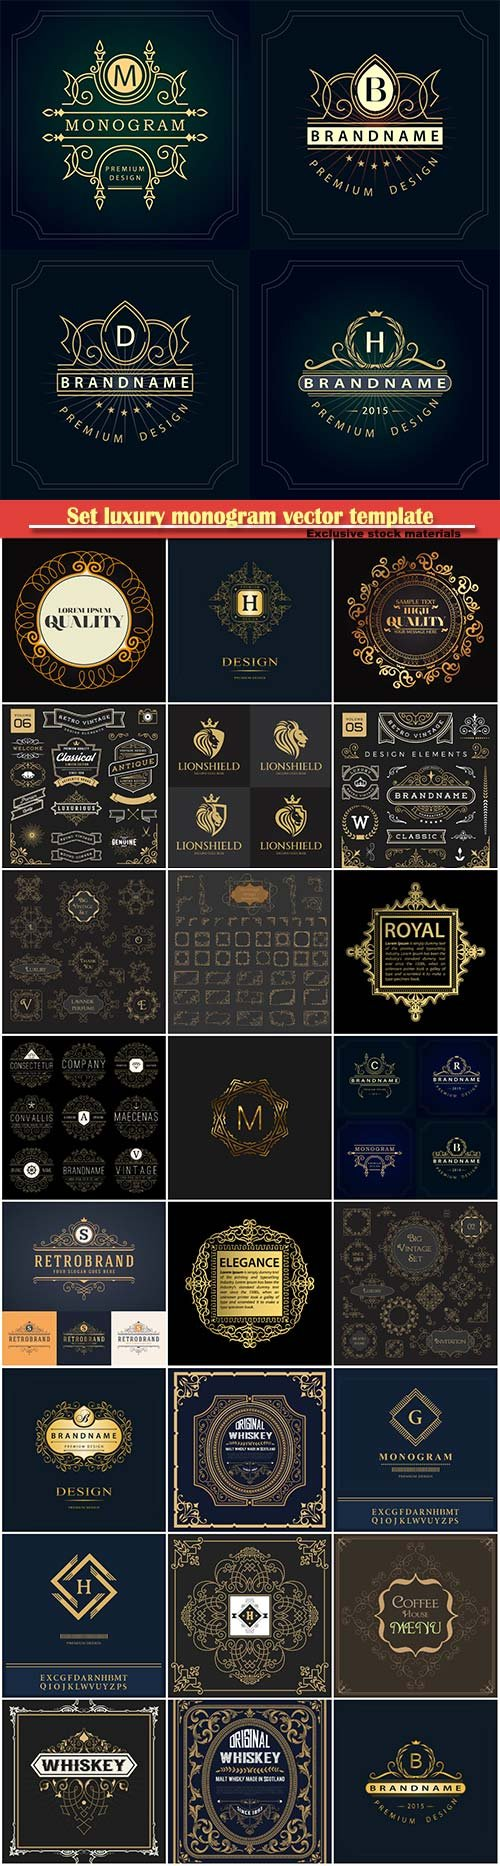 Set luxury monogram vector template, logos, badges, symbols # 12